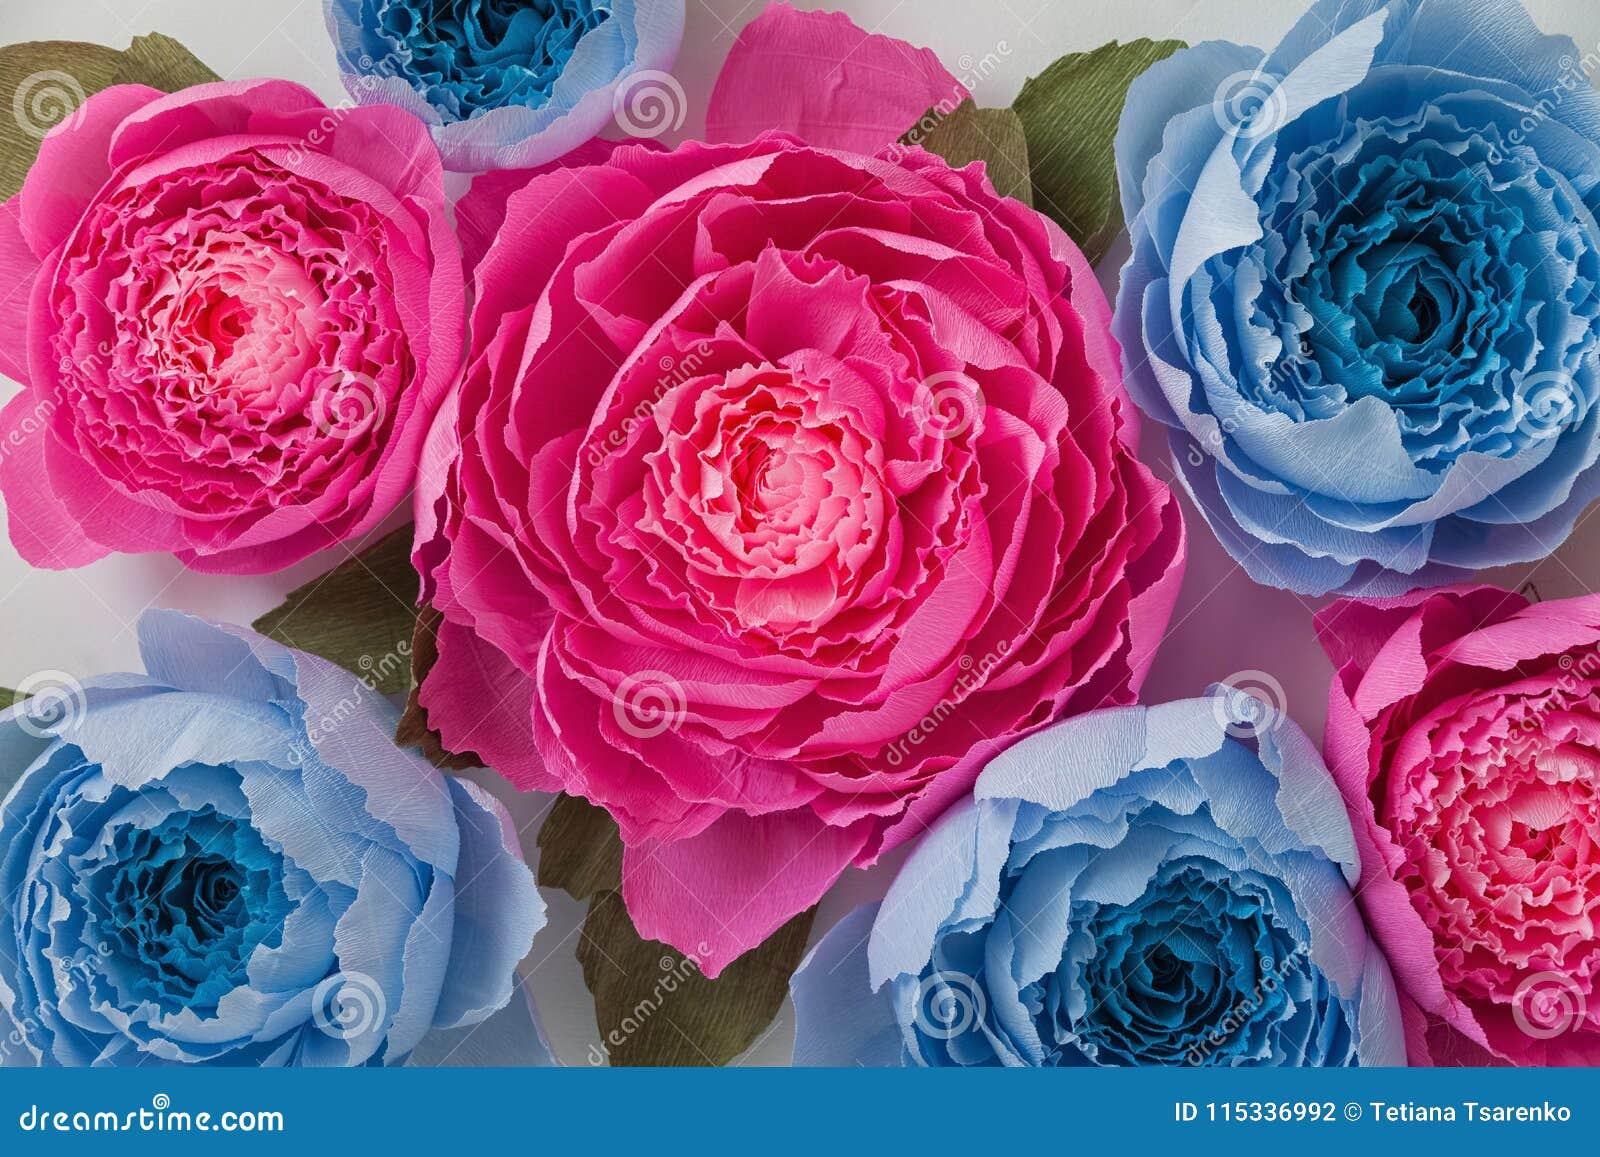 Corrugated paper roses